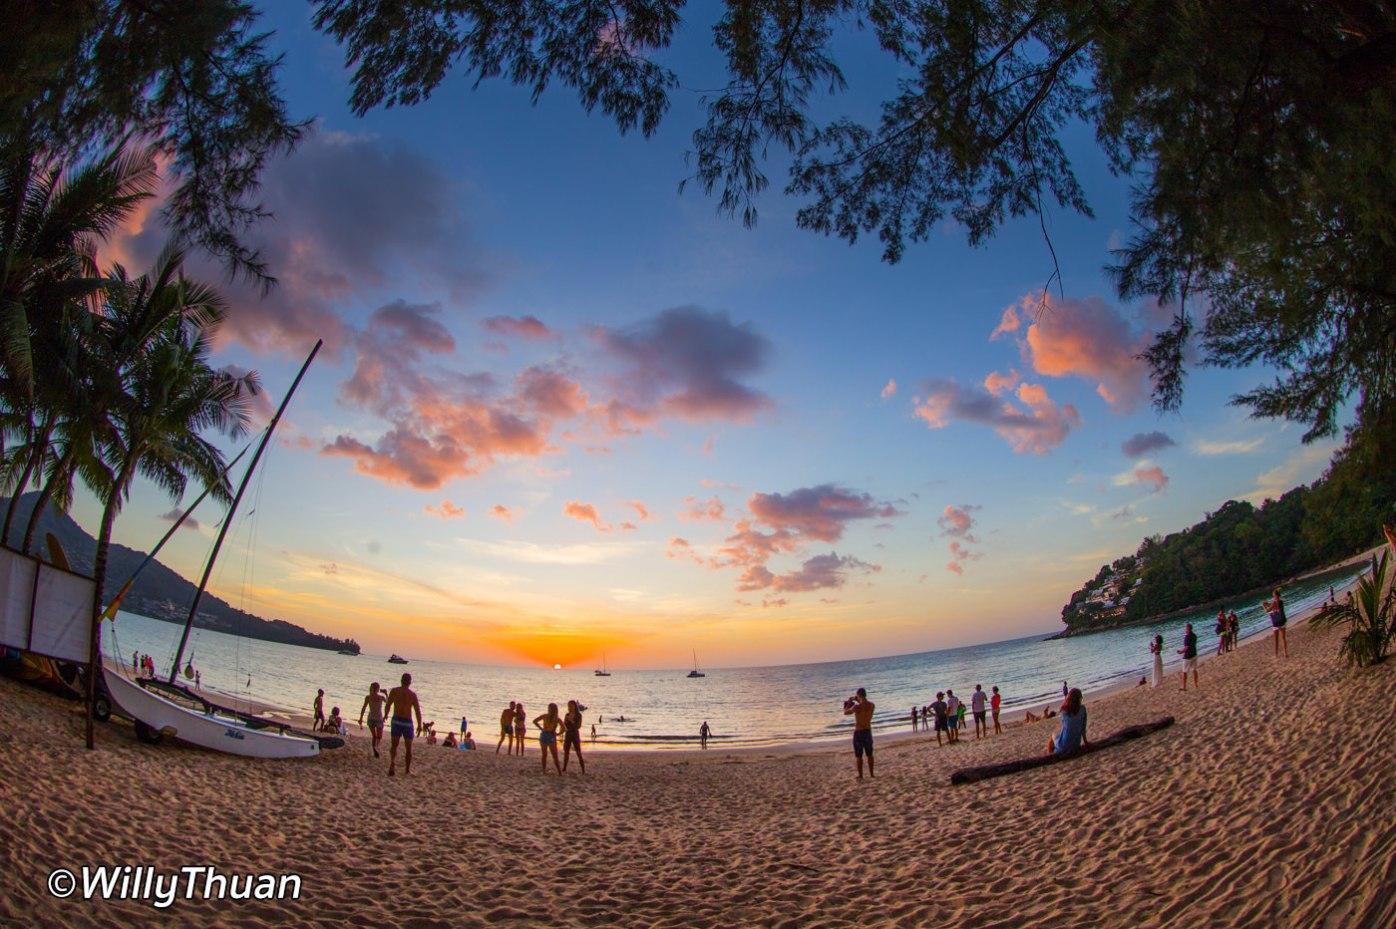 Sunset on Kamala Beach